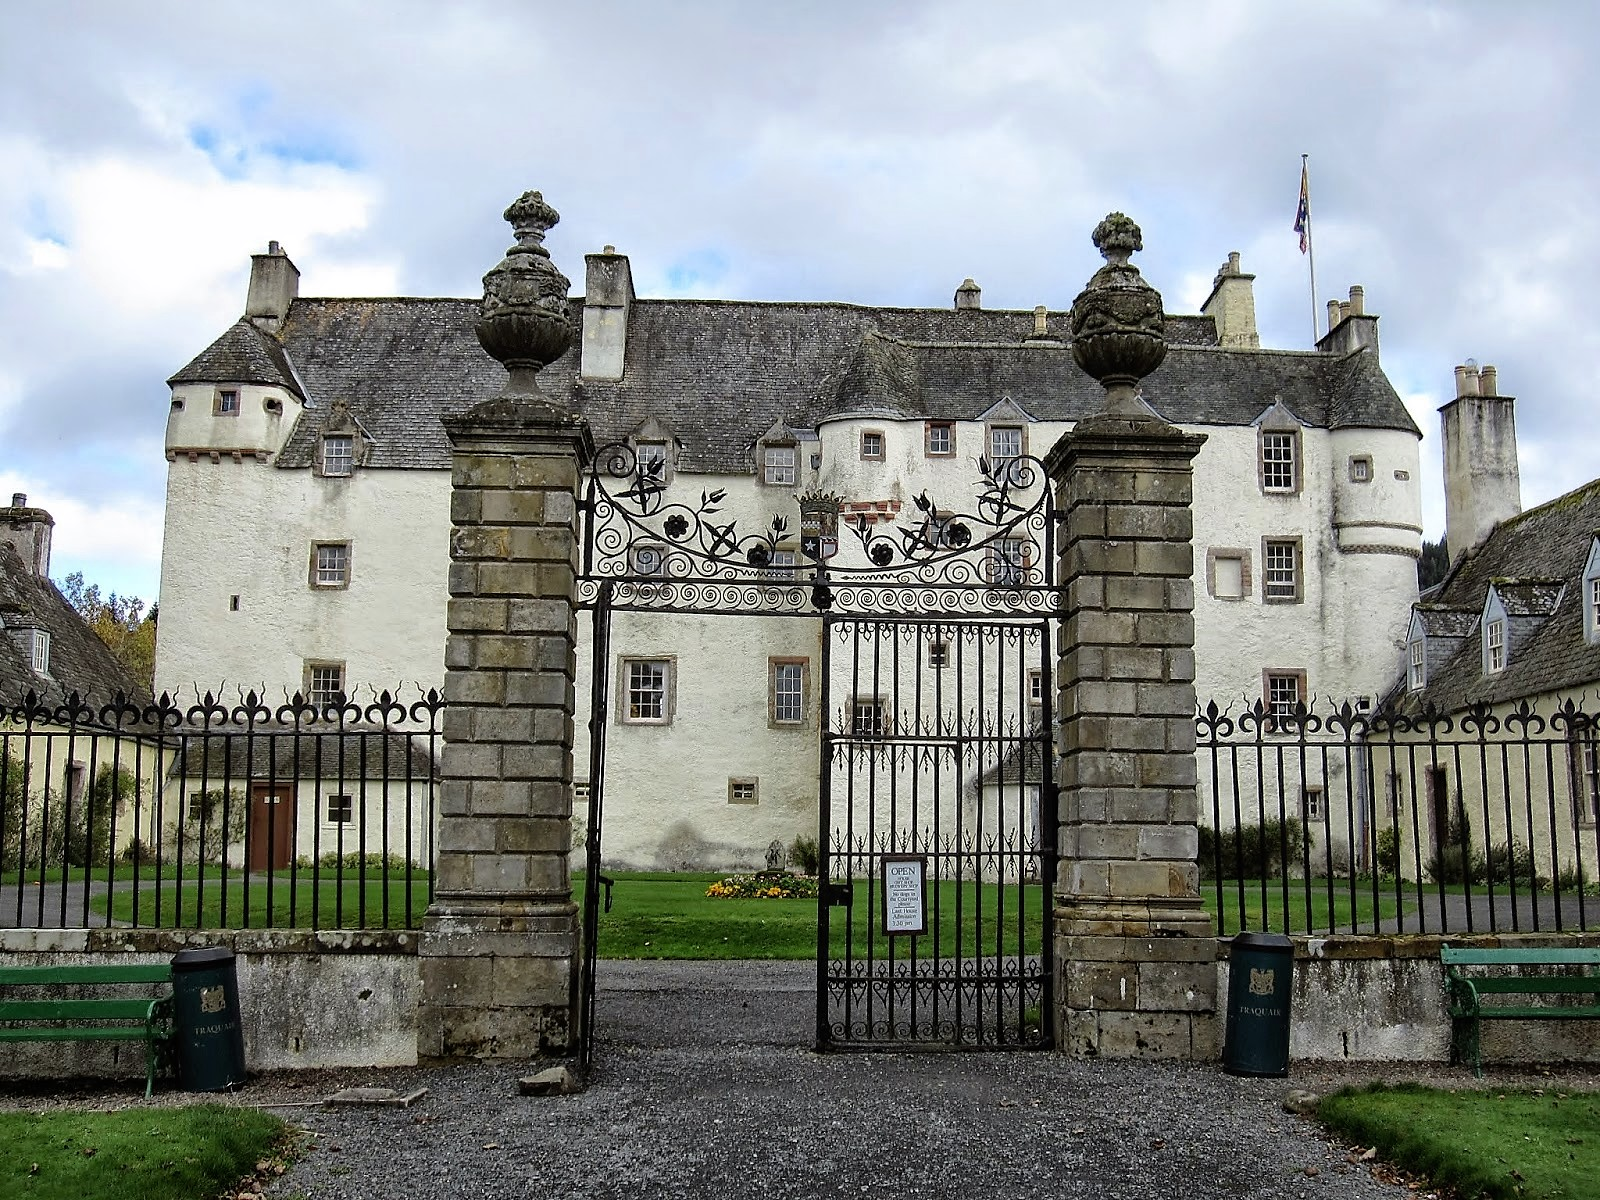 Fieggentrio wat is het oudste bewoonde huis ter wereld - Het mooiste huis ter wereld ...